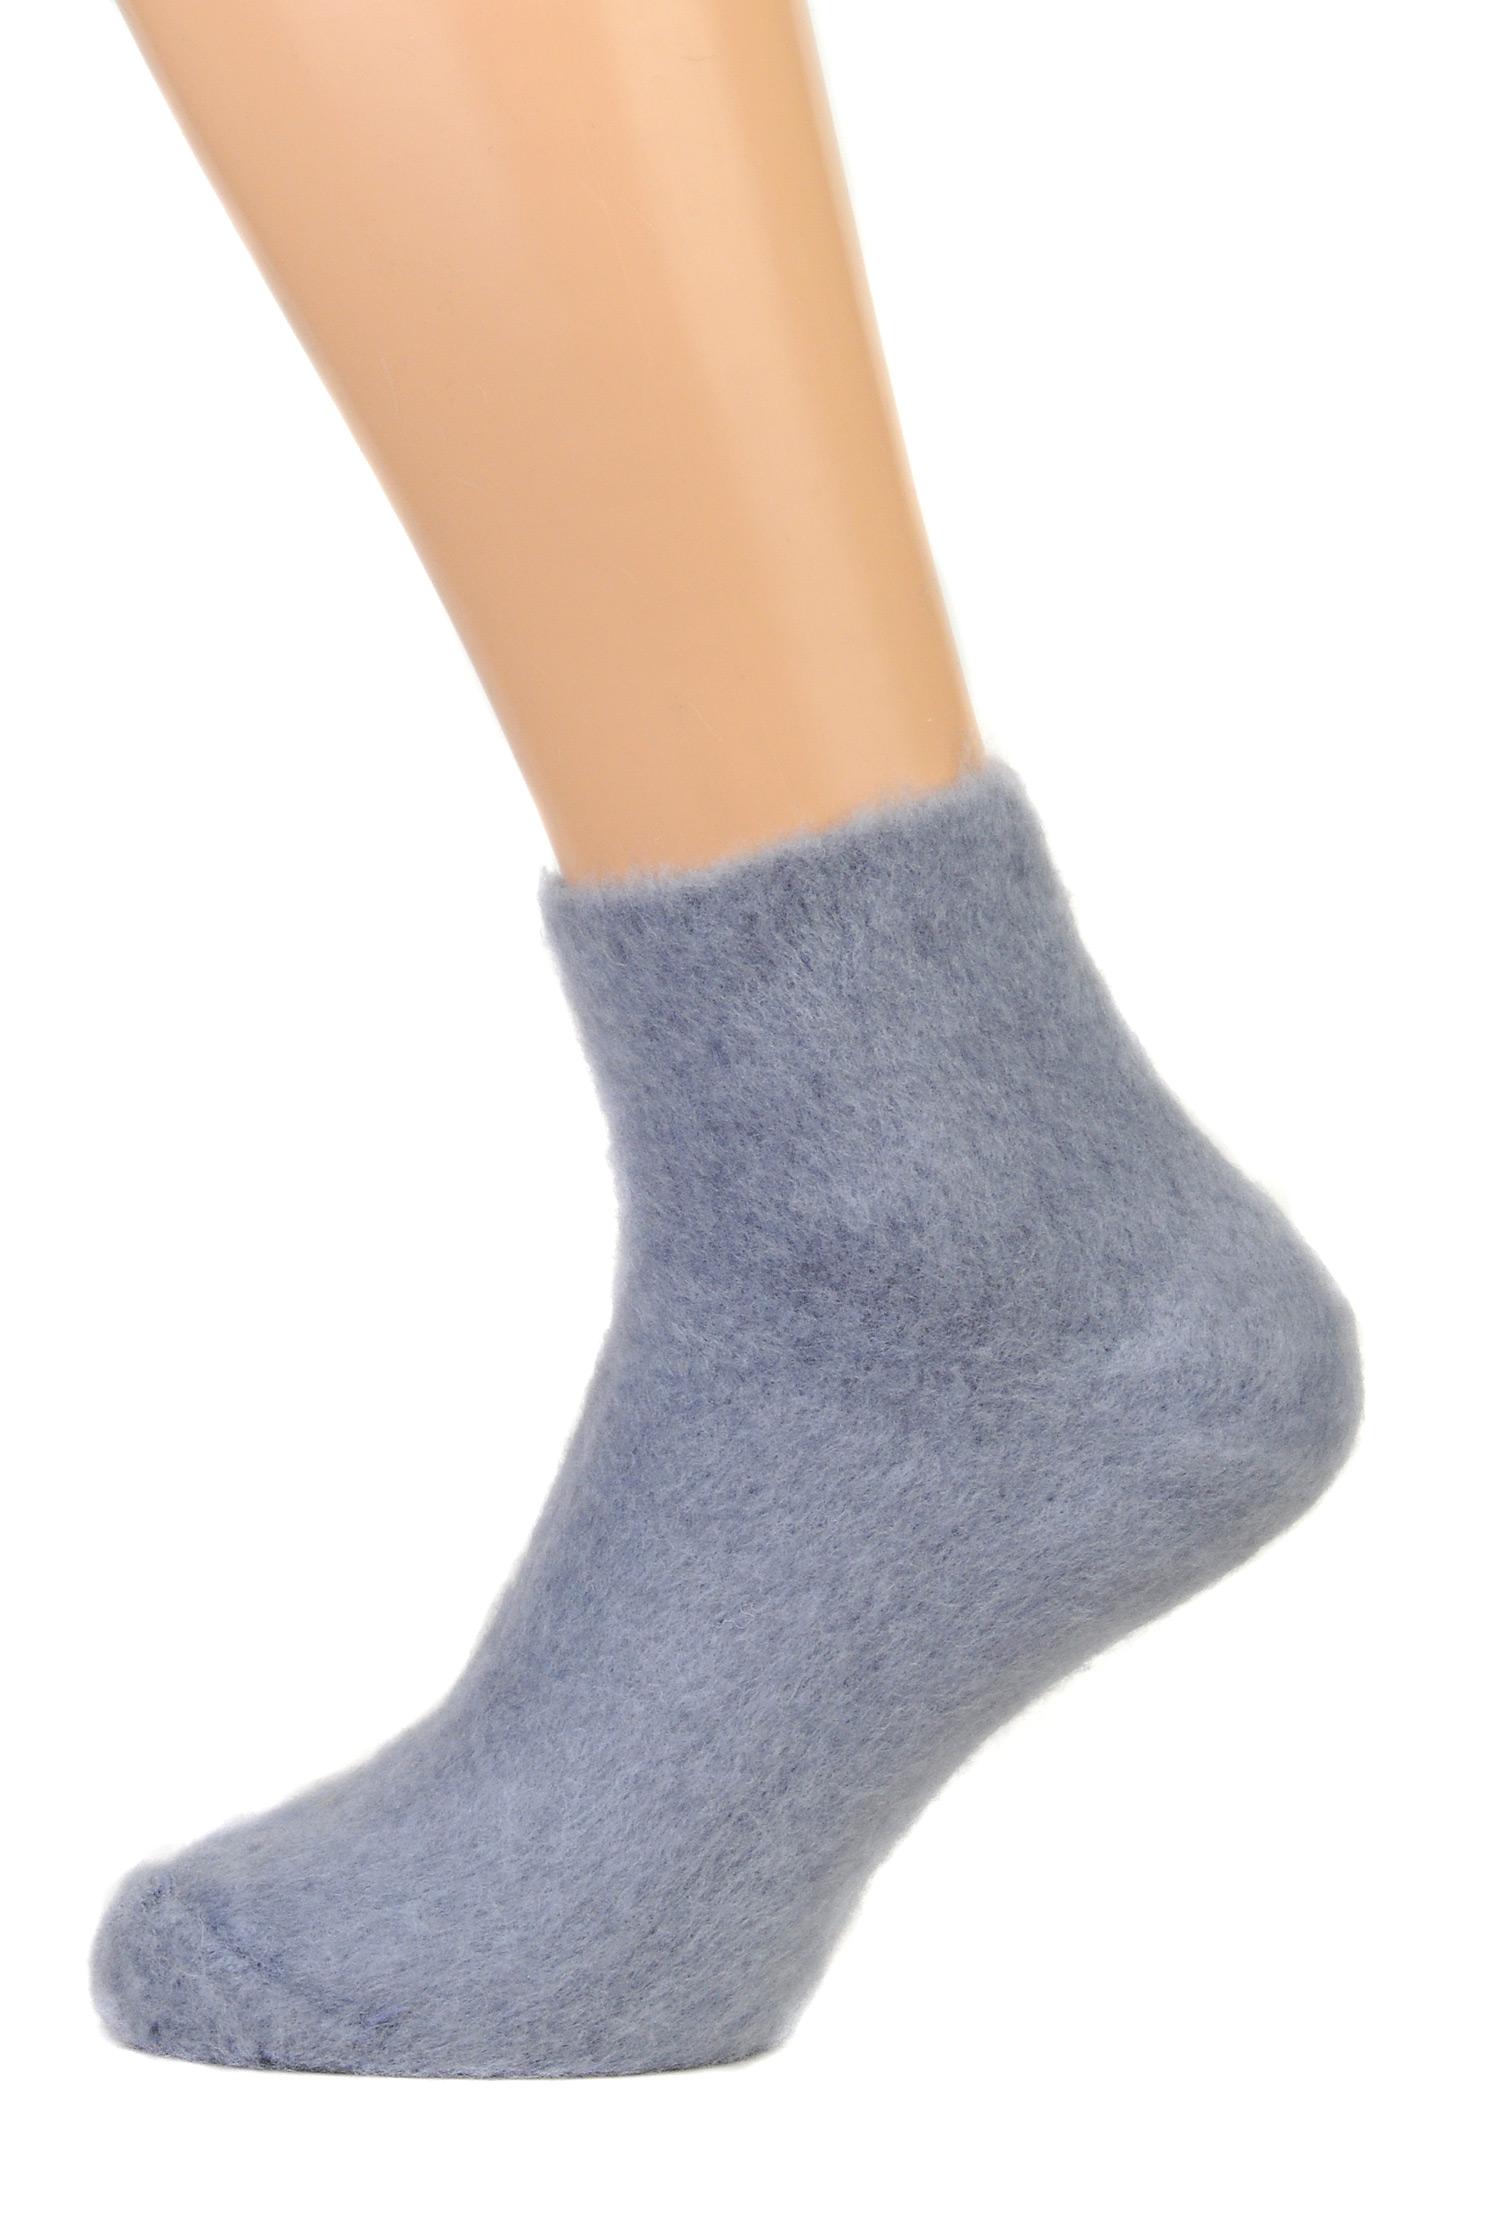 Фото женских ног носки 9 фотография